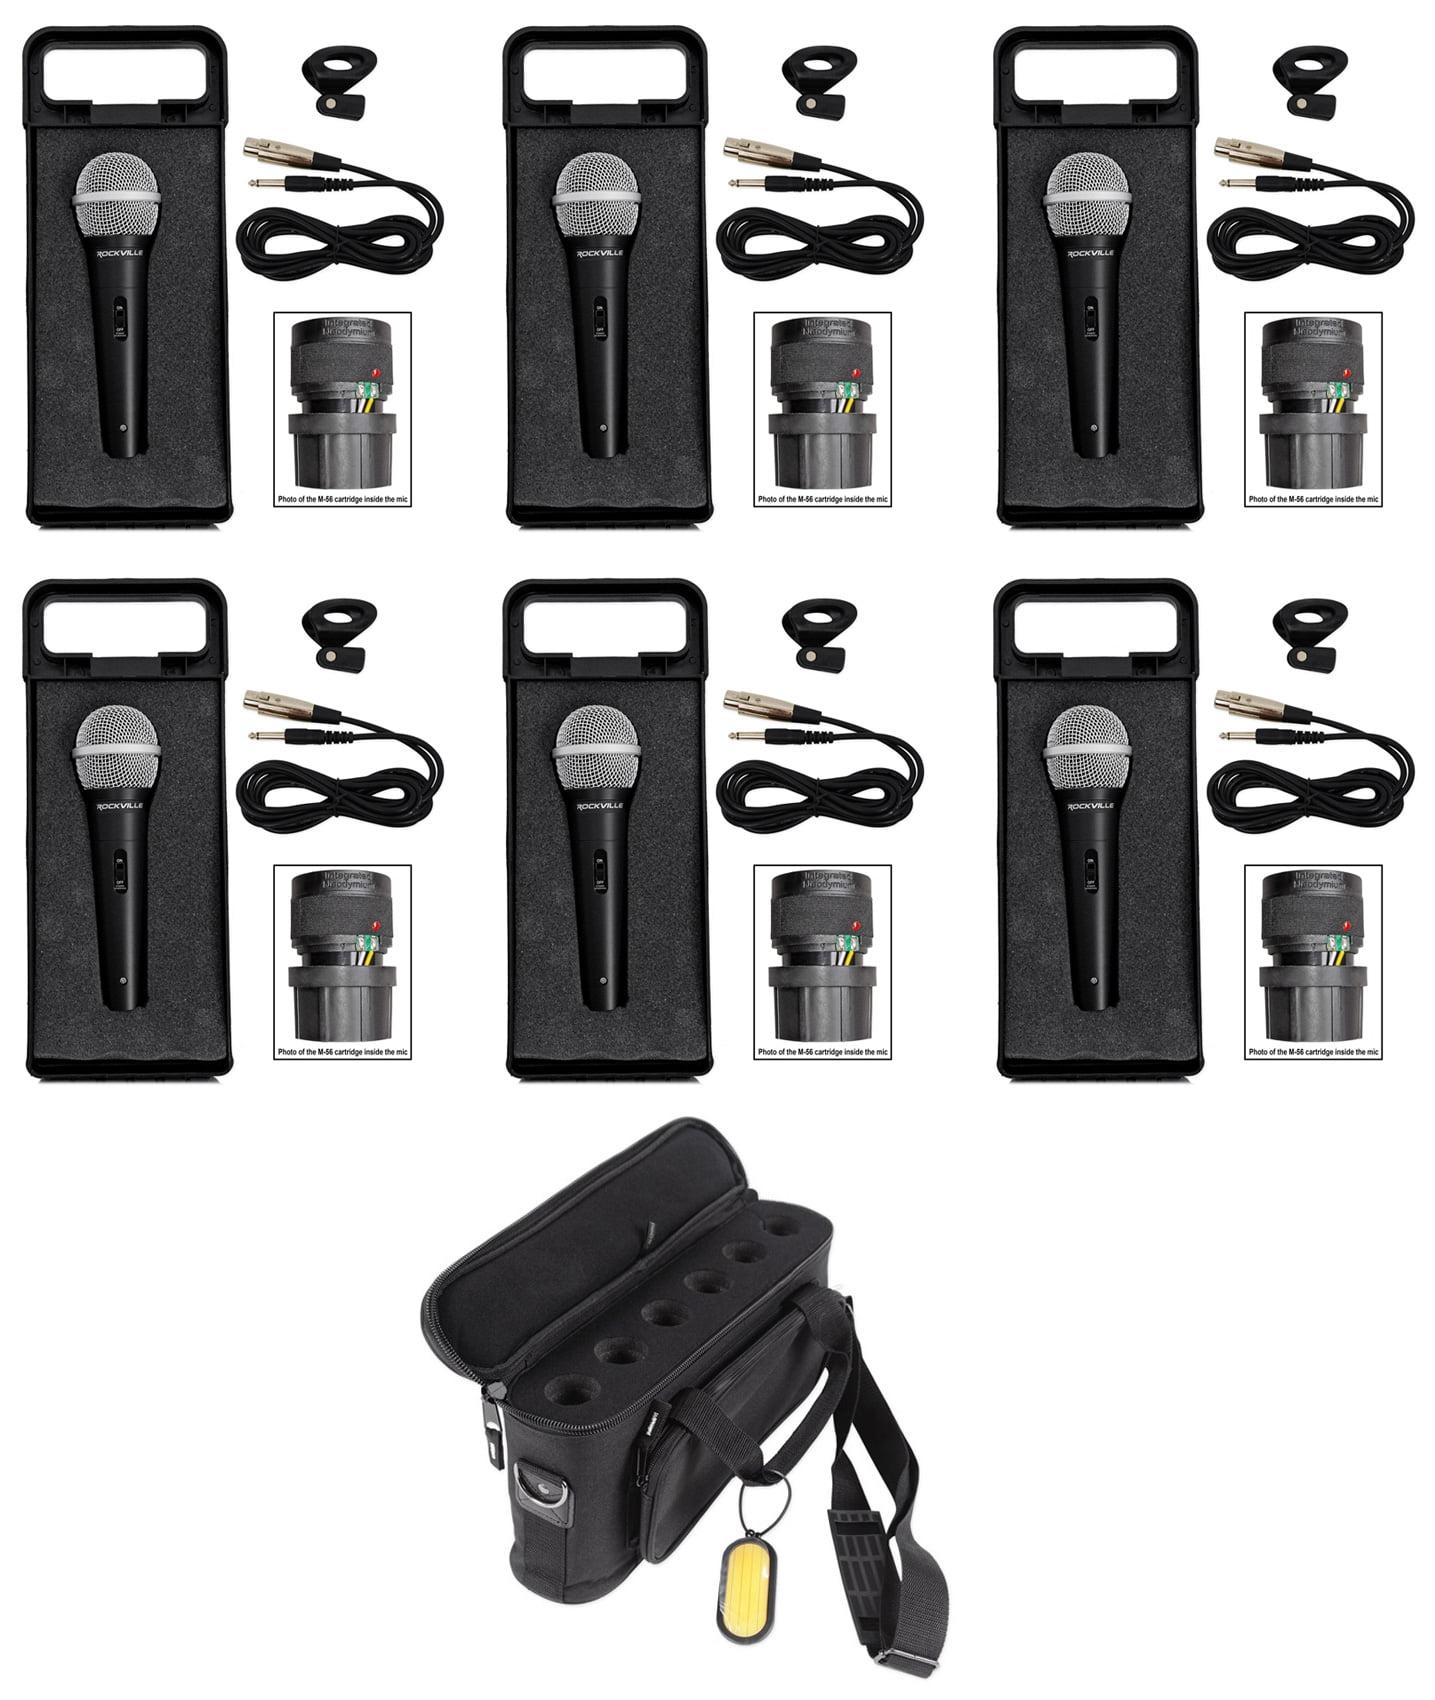 (6) Rockville RMM-XLR Dynamic Cardiod Professional Metal Microphone+6 Space Mic Bag by ROCKVILLE